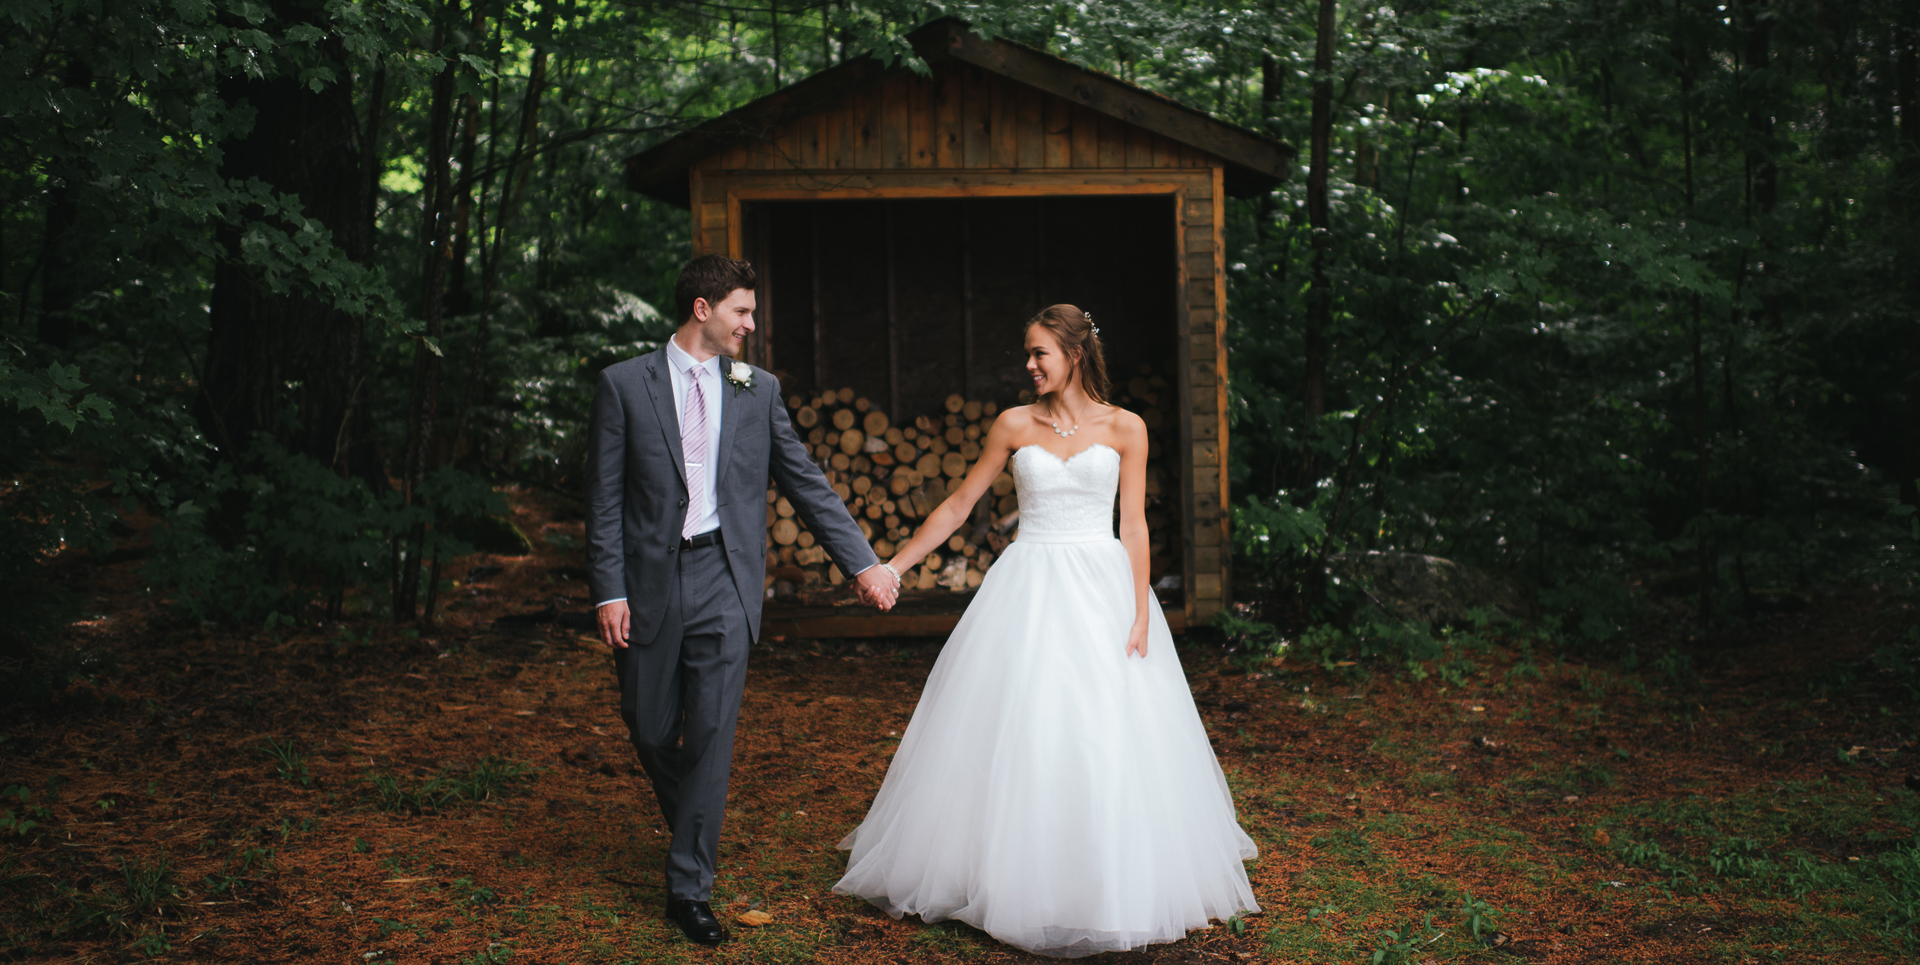 Weddings at Bark Lake Leadership Centre